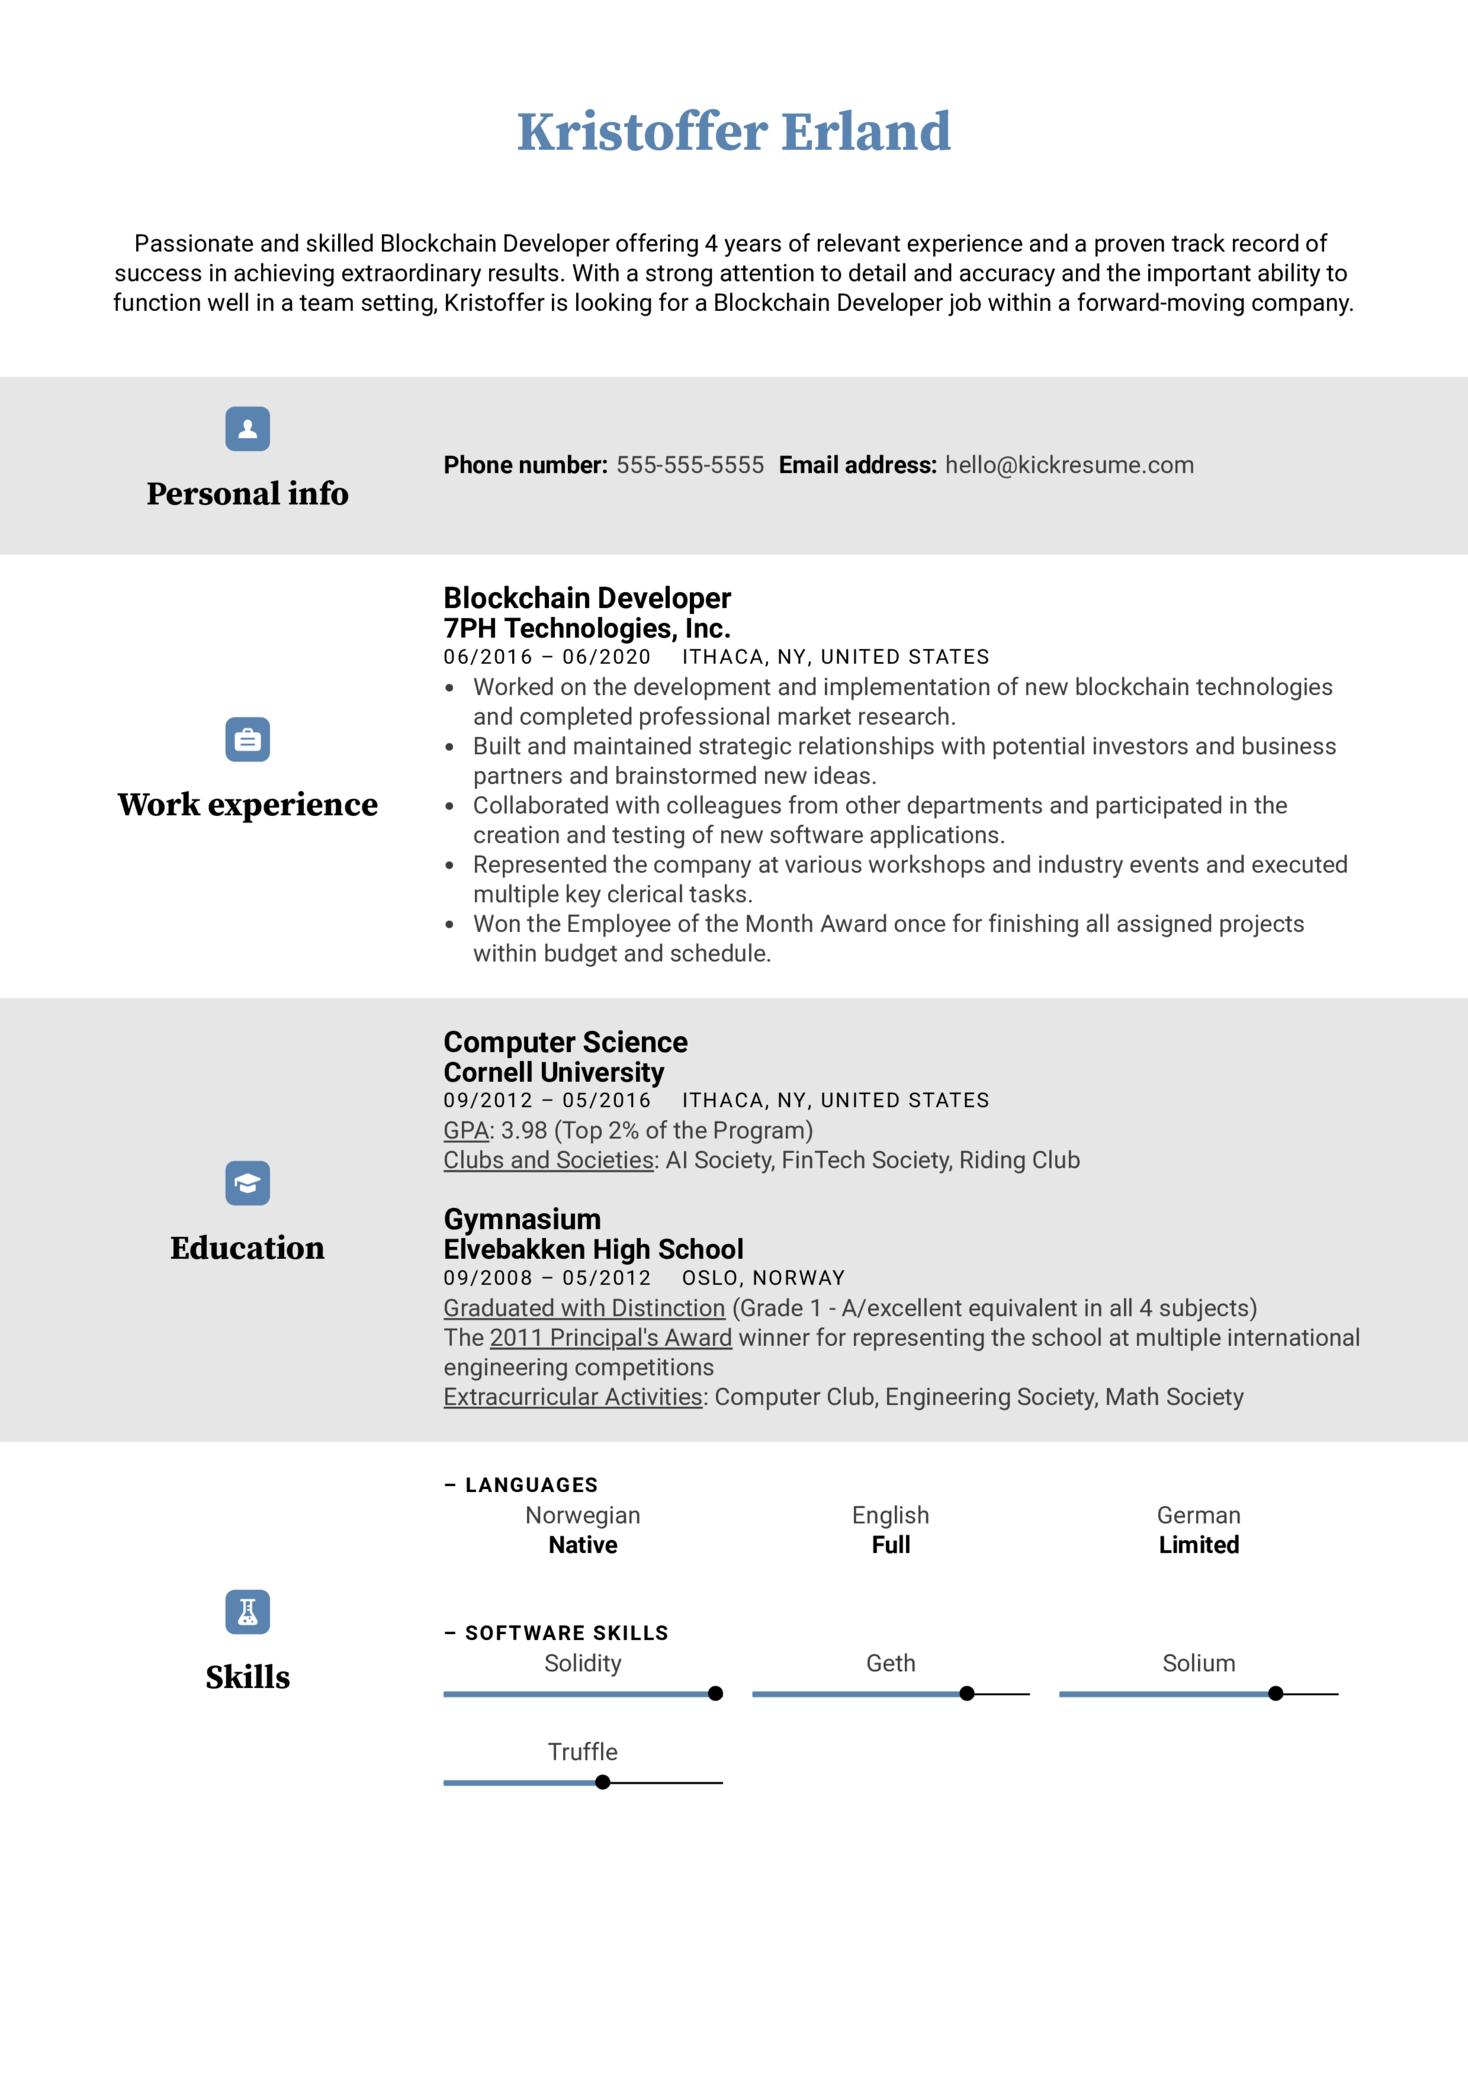 Blockchain Developer Resume Example (Part 1)